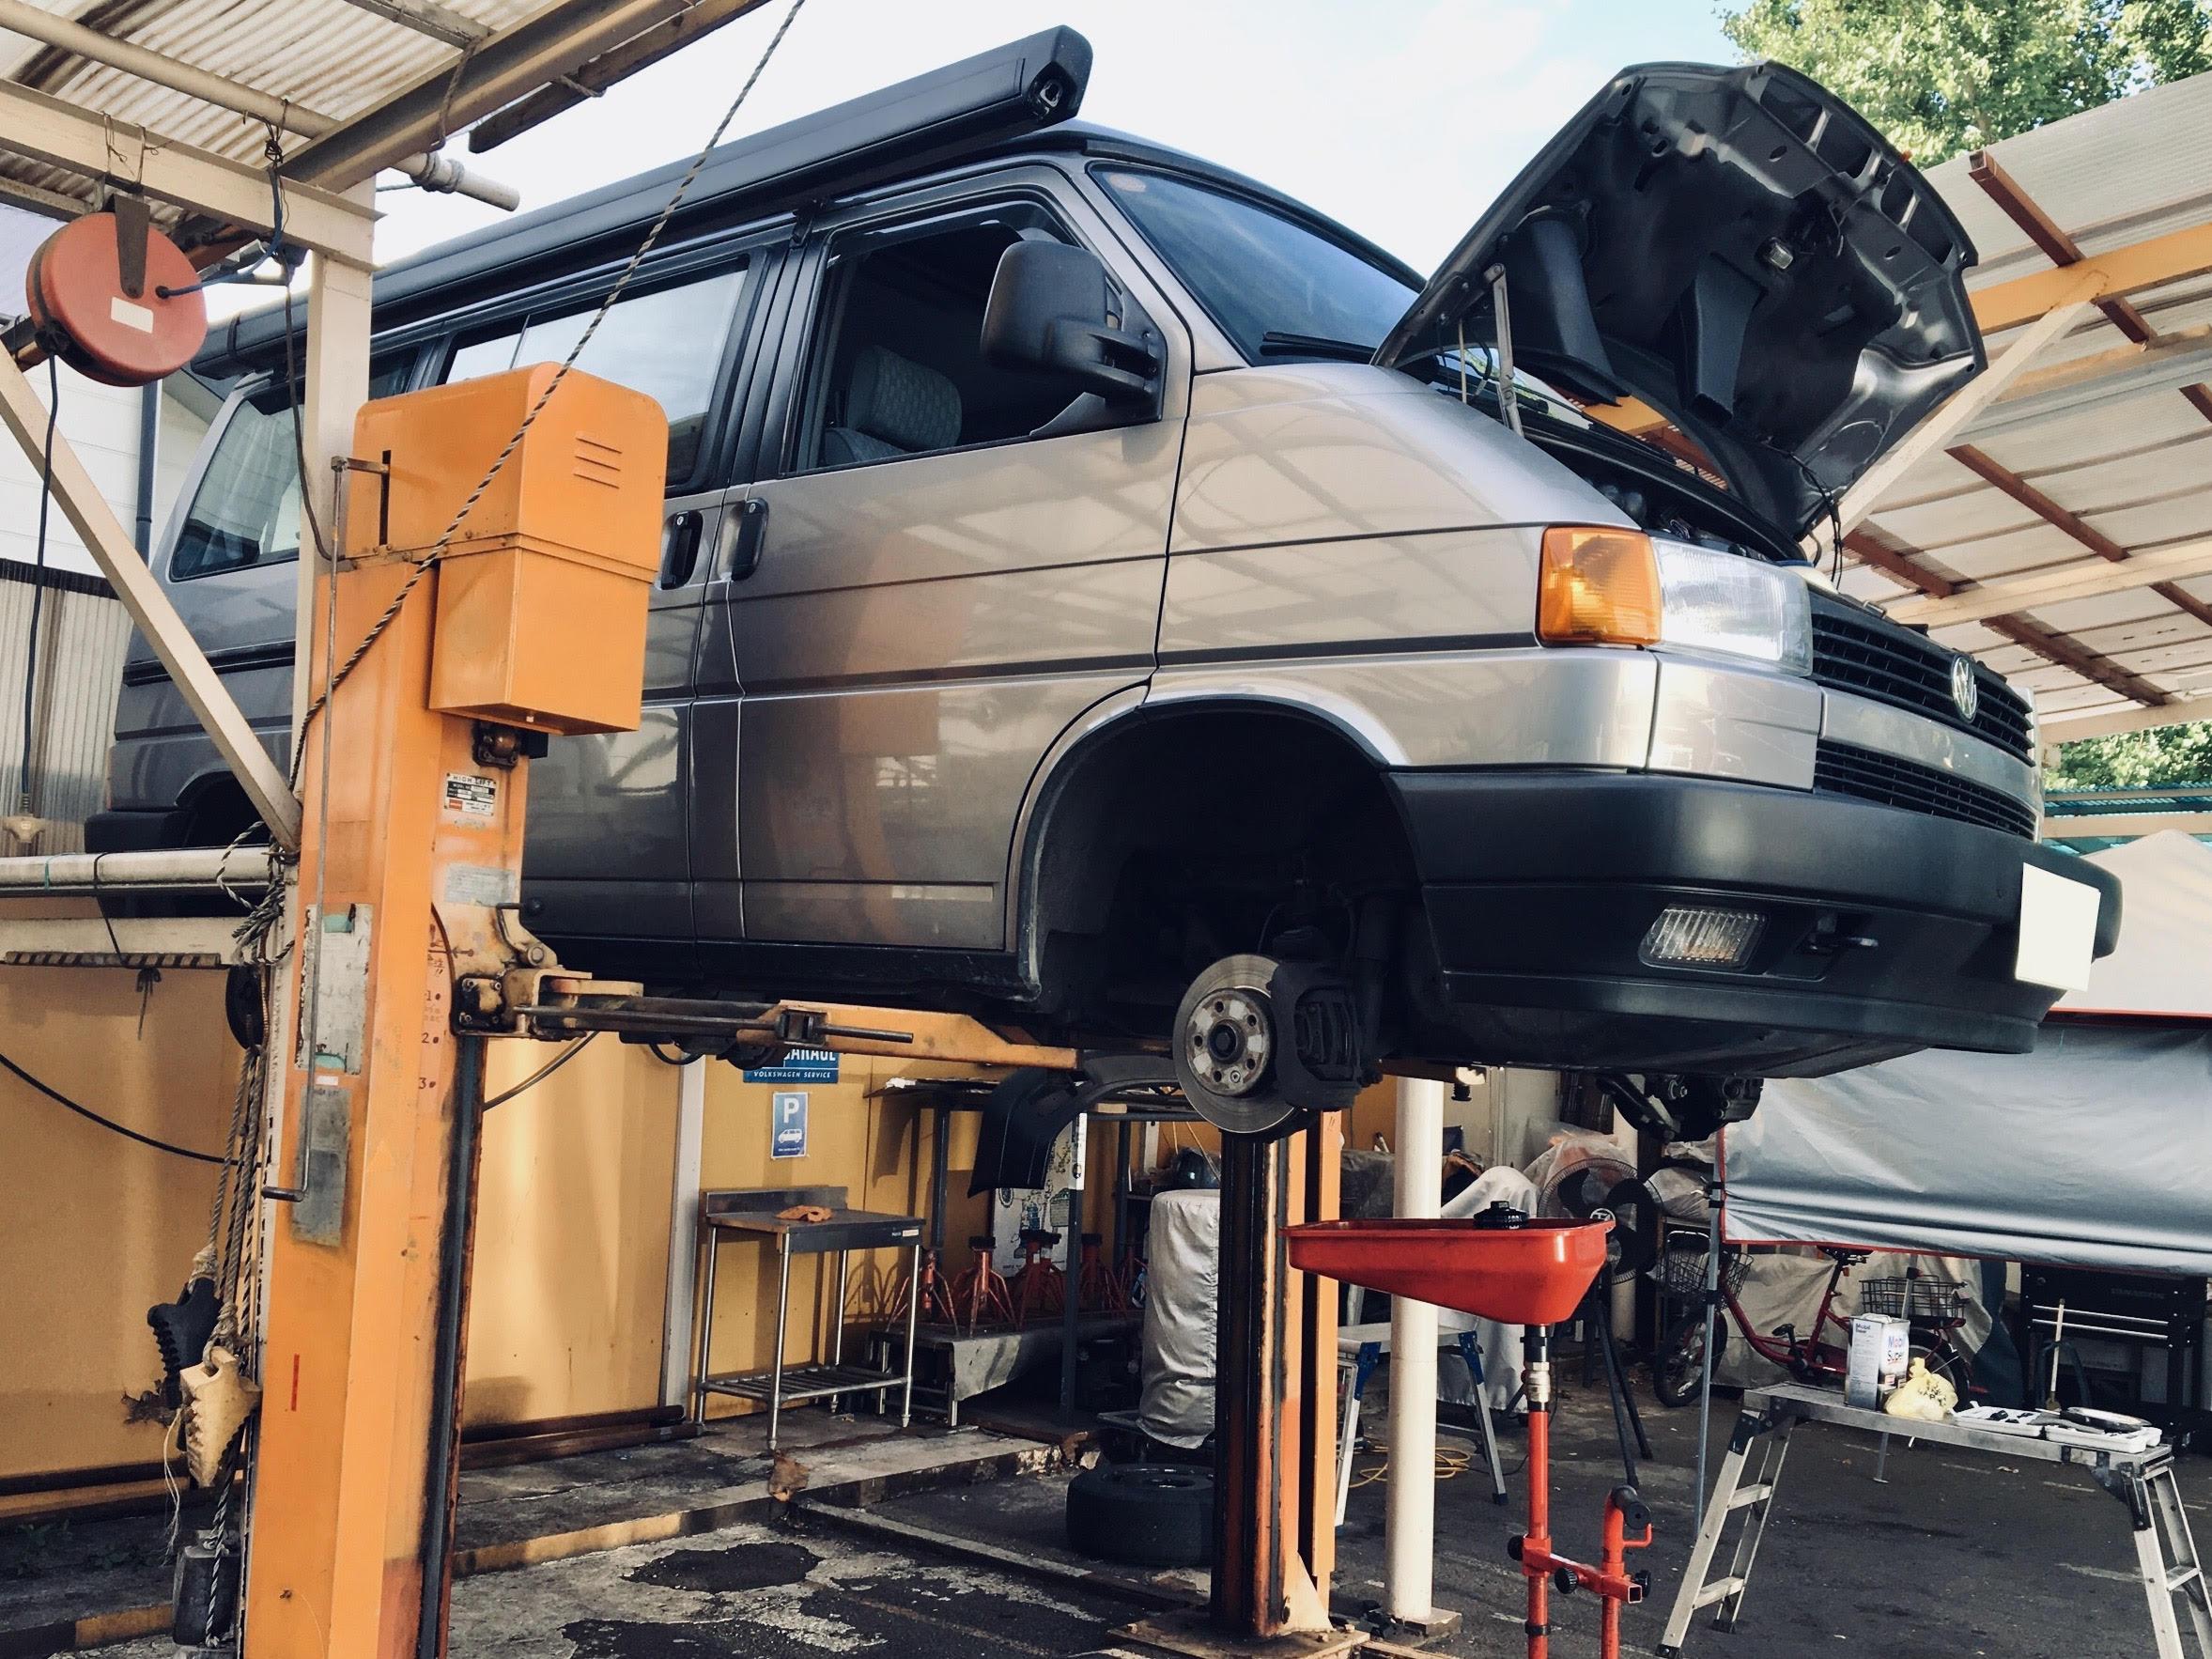 DIY&プロショップで定期メンテナンスを実施。9月実施済メニュー:オイル交換.タイヤ交換.ブレーキ点検等。ベストを尽くしてお渡しします。